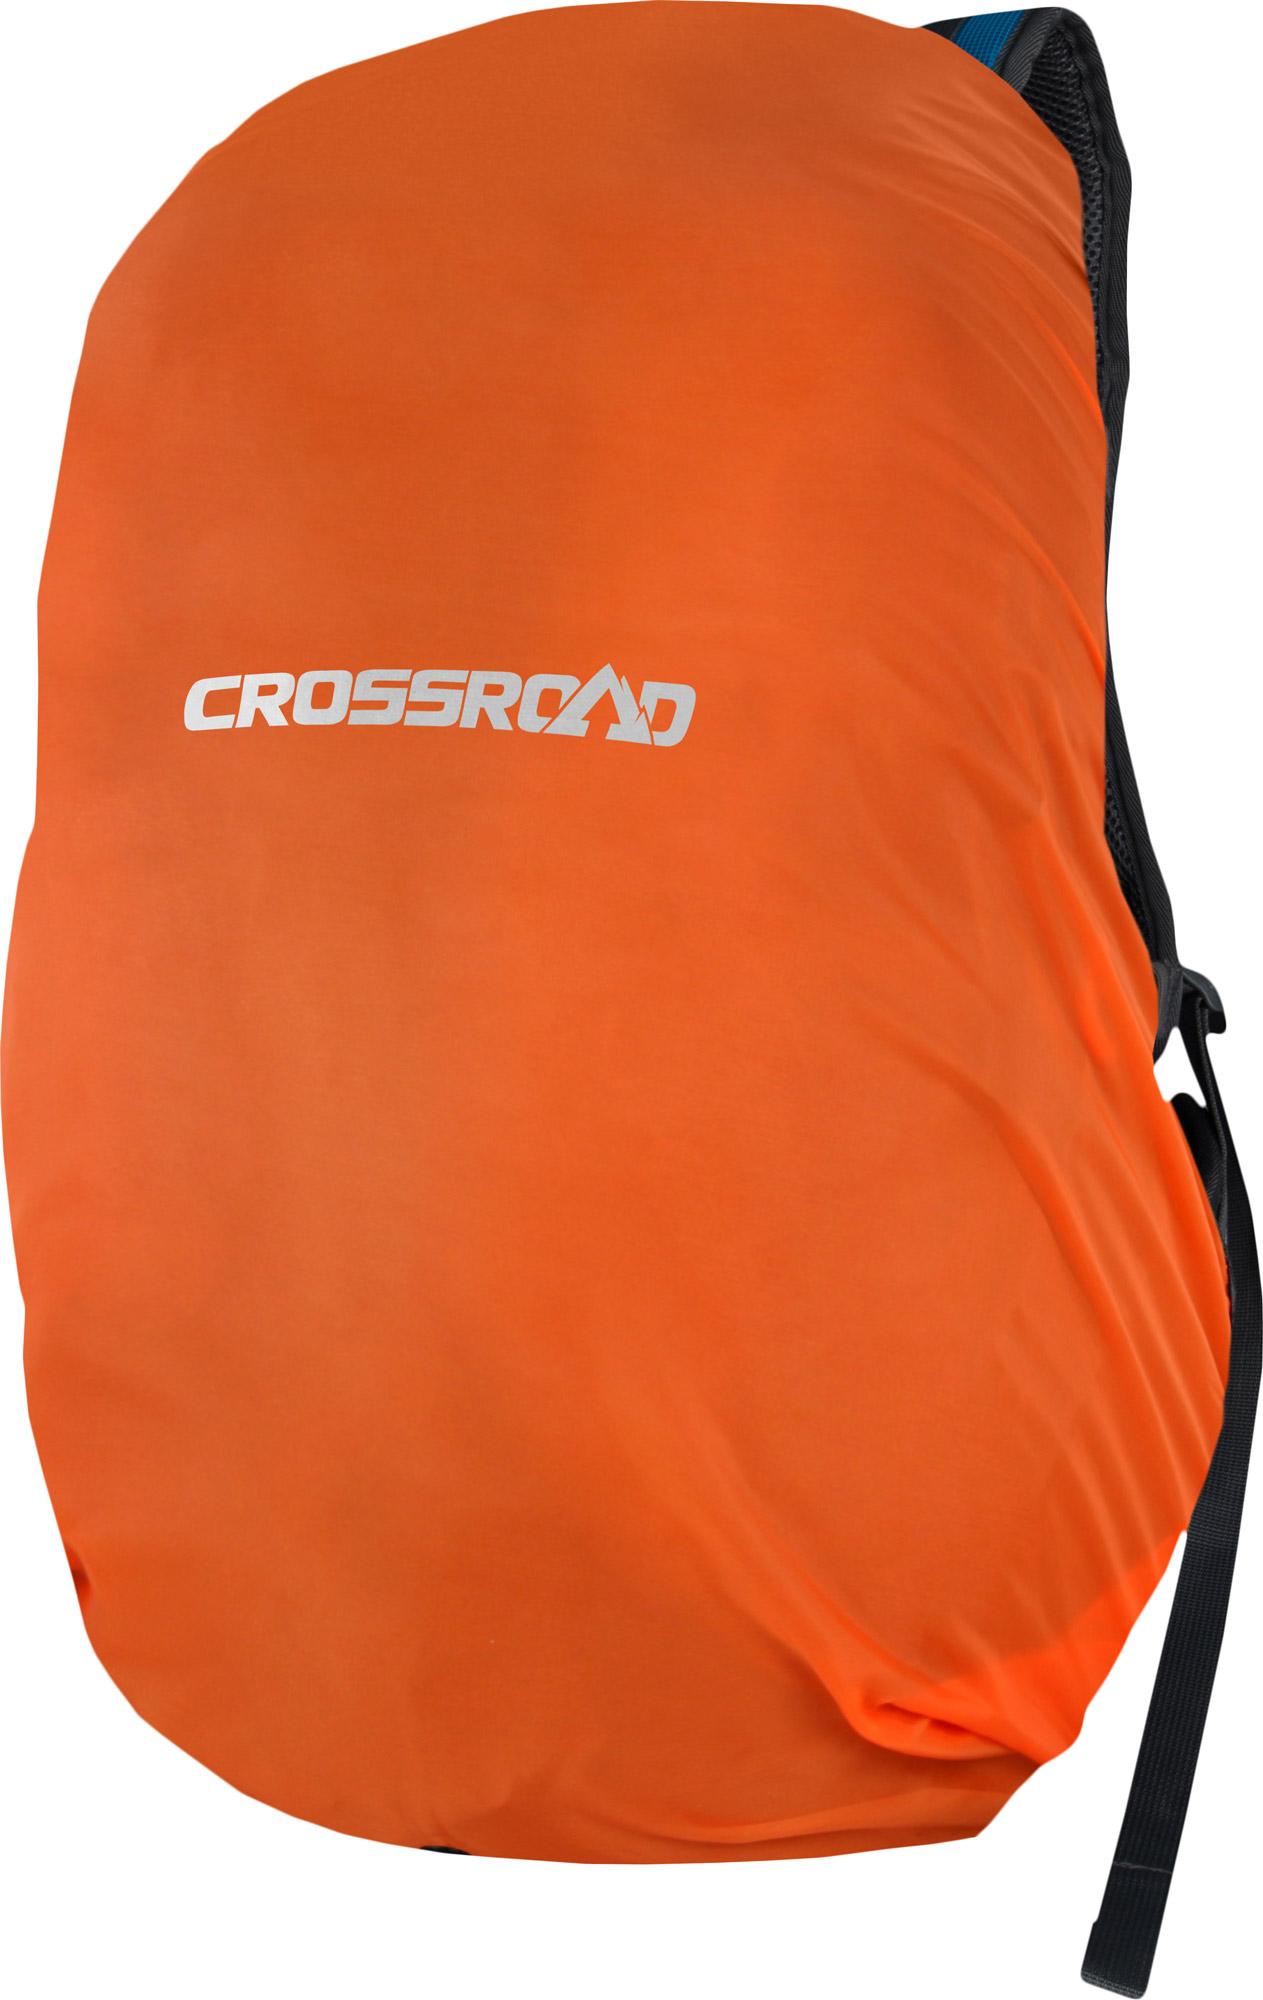 719e4a2c7f Crossroad CARGO 30. Turistický odvětraný batoh